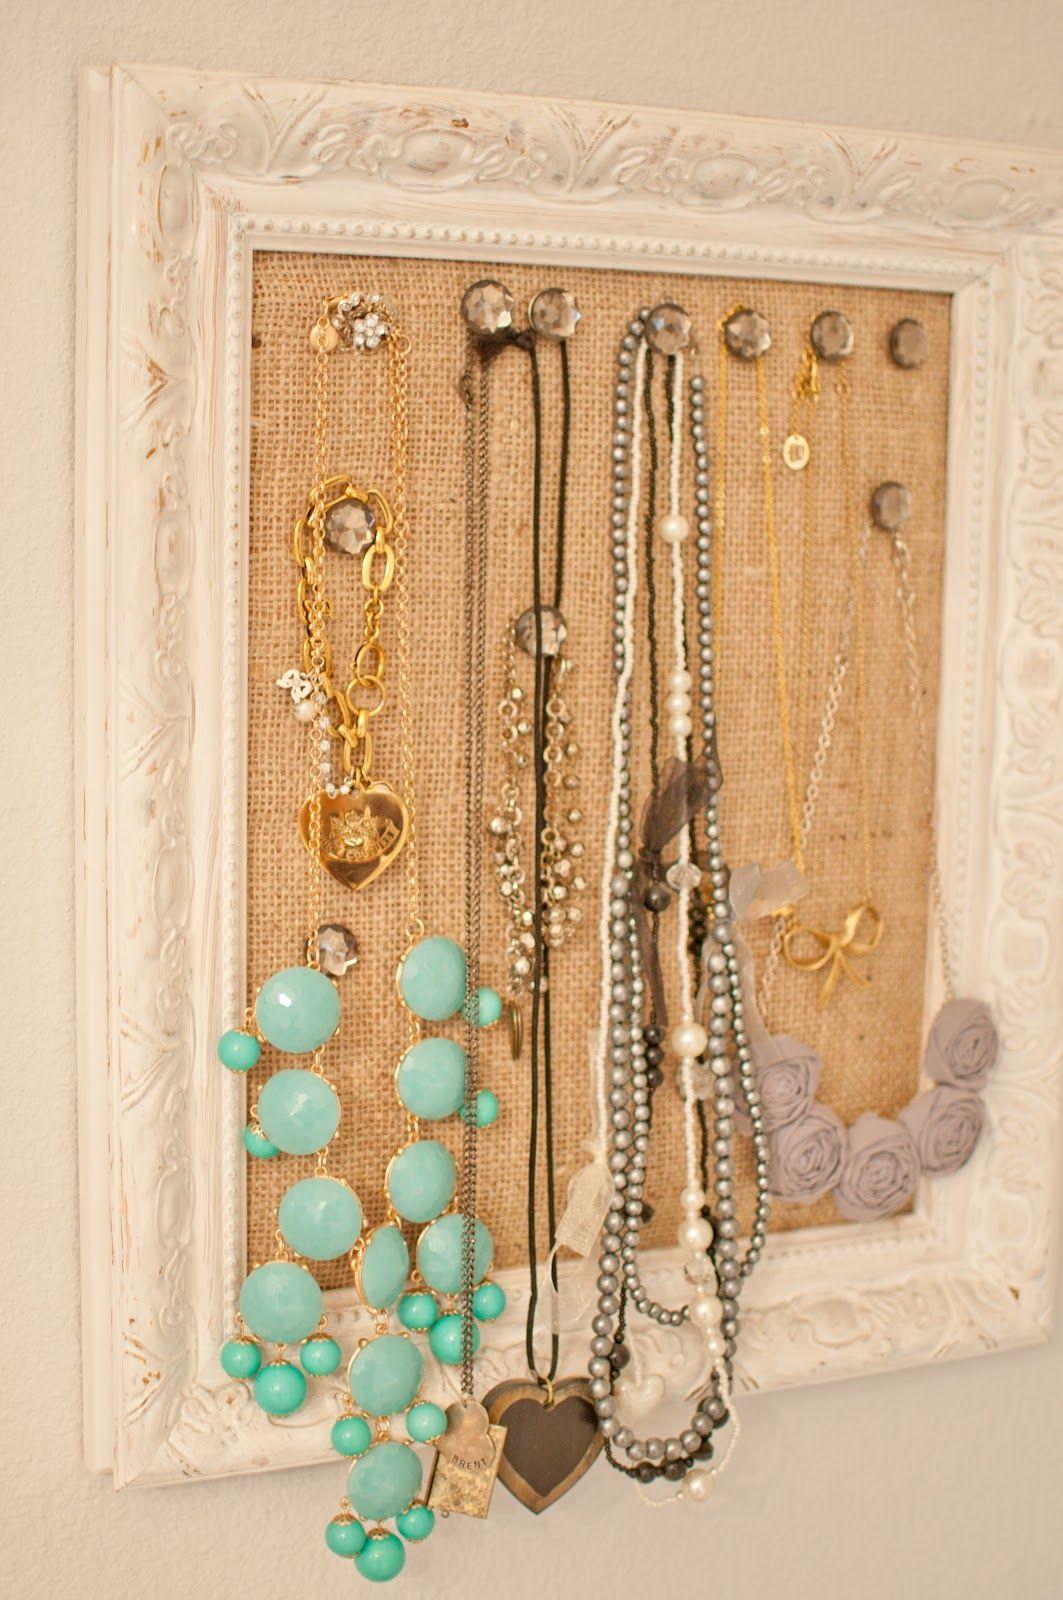 Domestic fashionista diy cork board jewelry frame bedroom domestic fashionista diy cork board jewelry frame solutioingenieria Choice Image